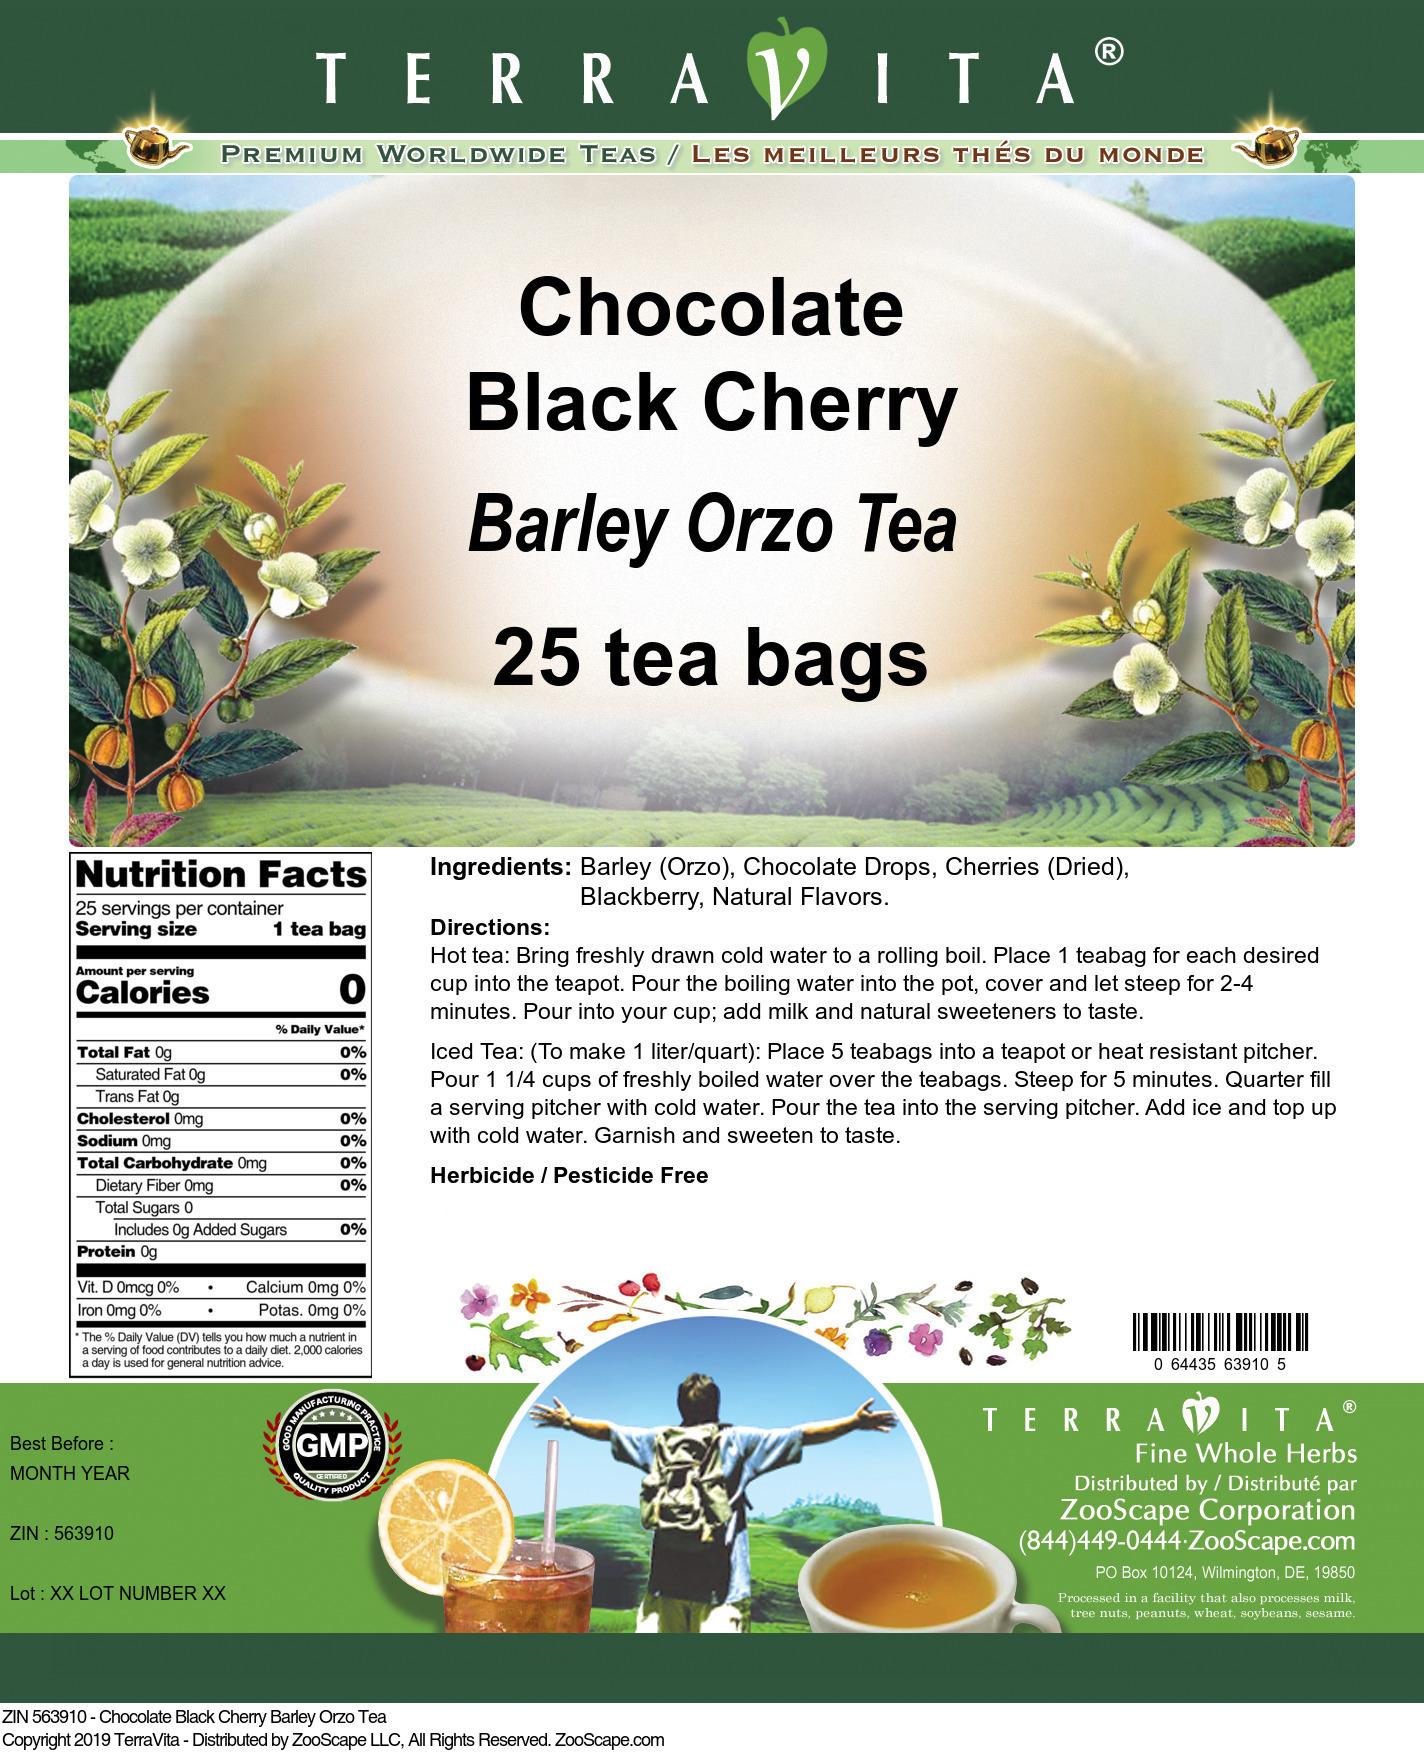 Chocolate Black Cherry Barley Orzo Tea